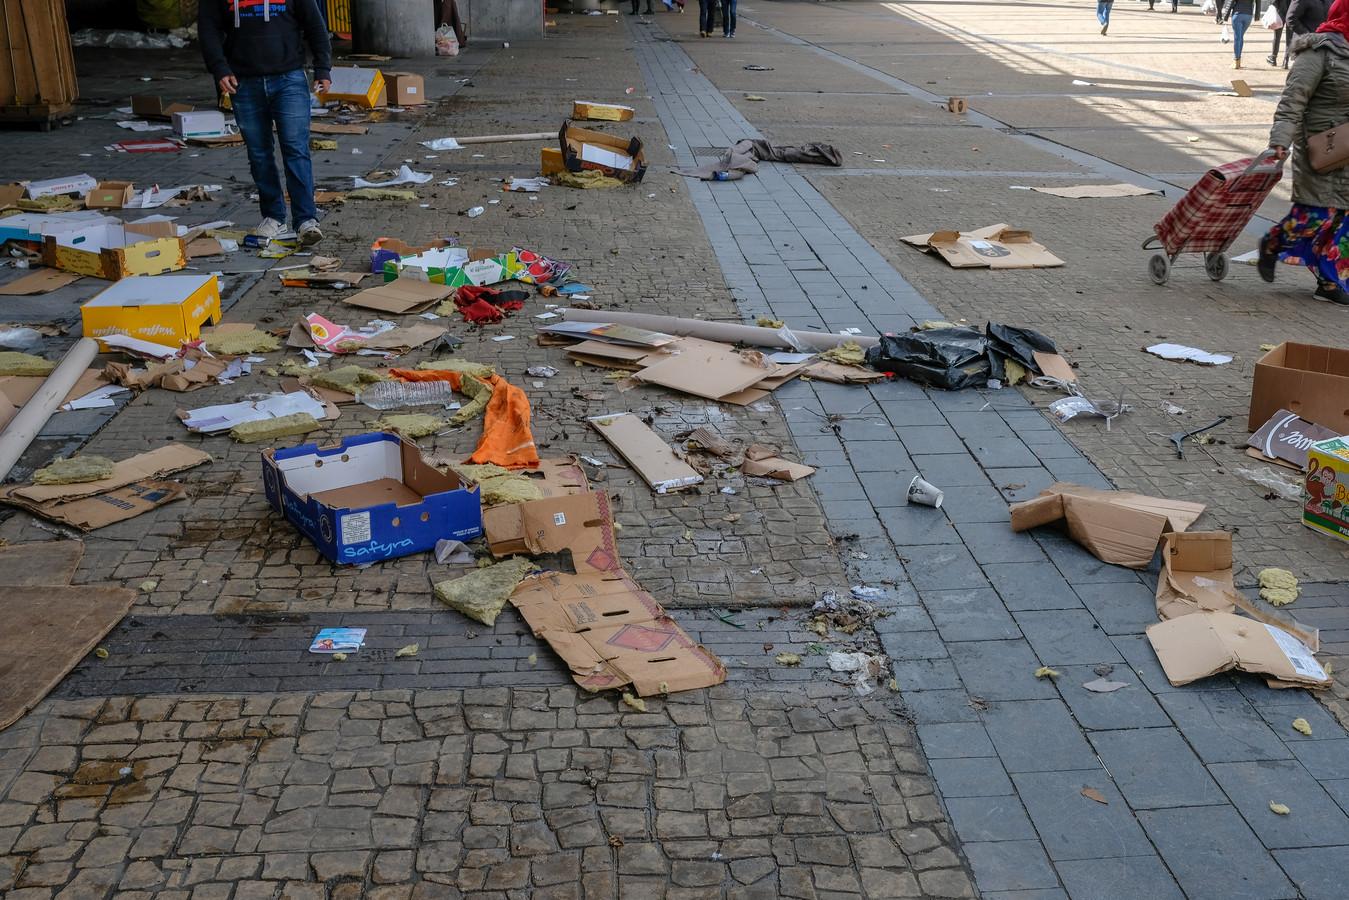 Na de markt blijft veel afval achter